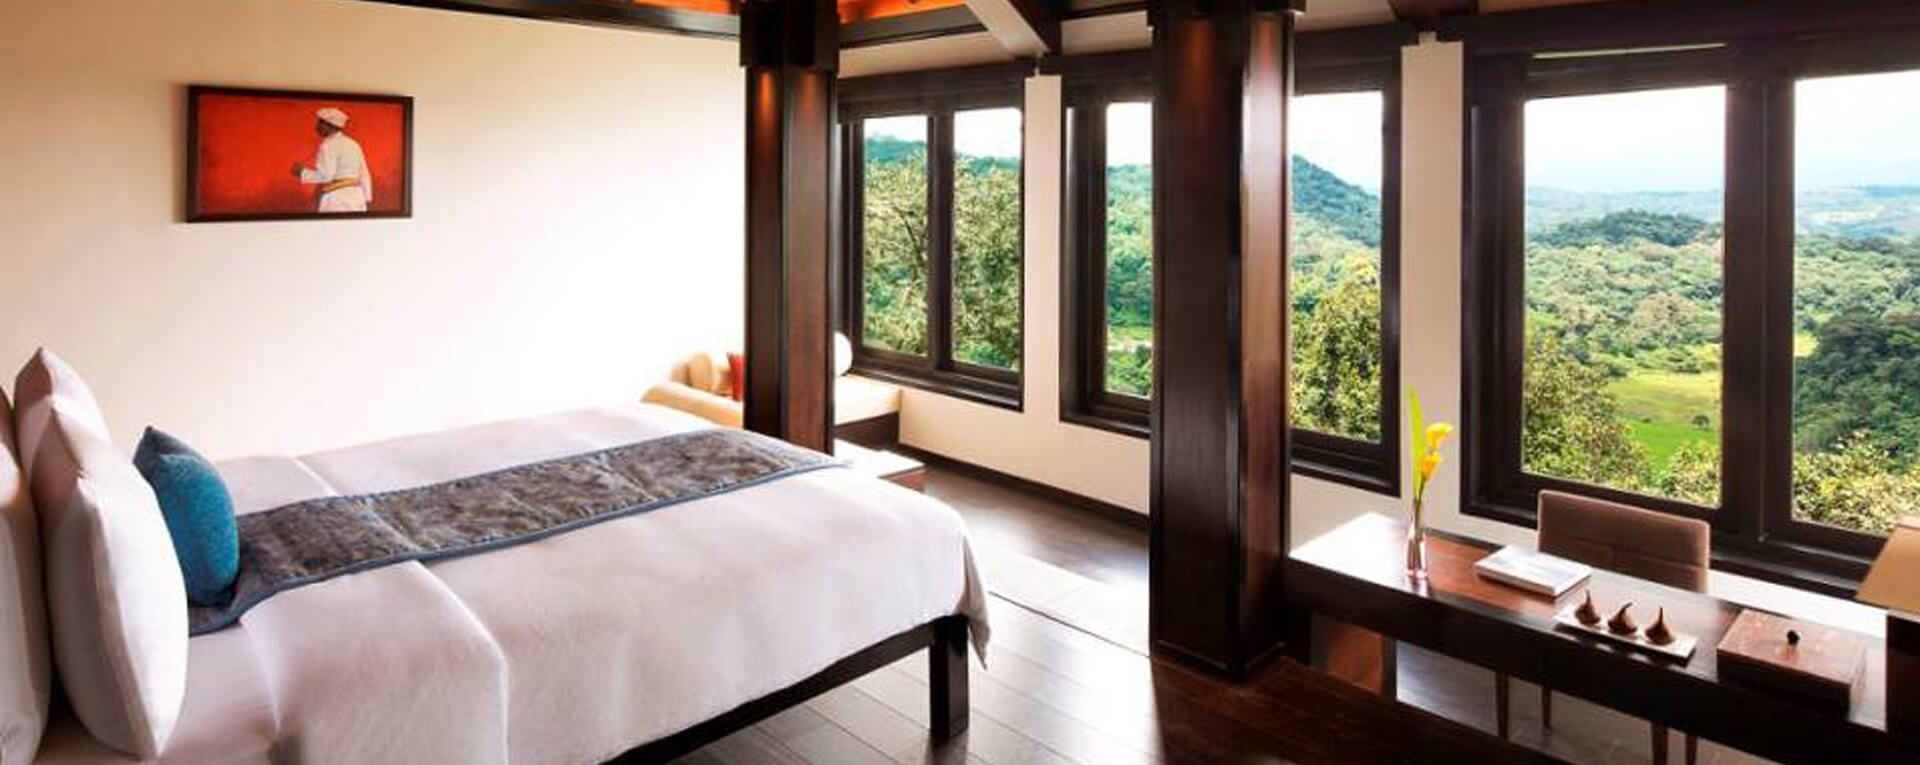 Taj Madikeri Resort and Spa, Coorg